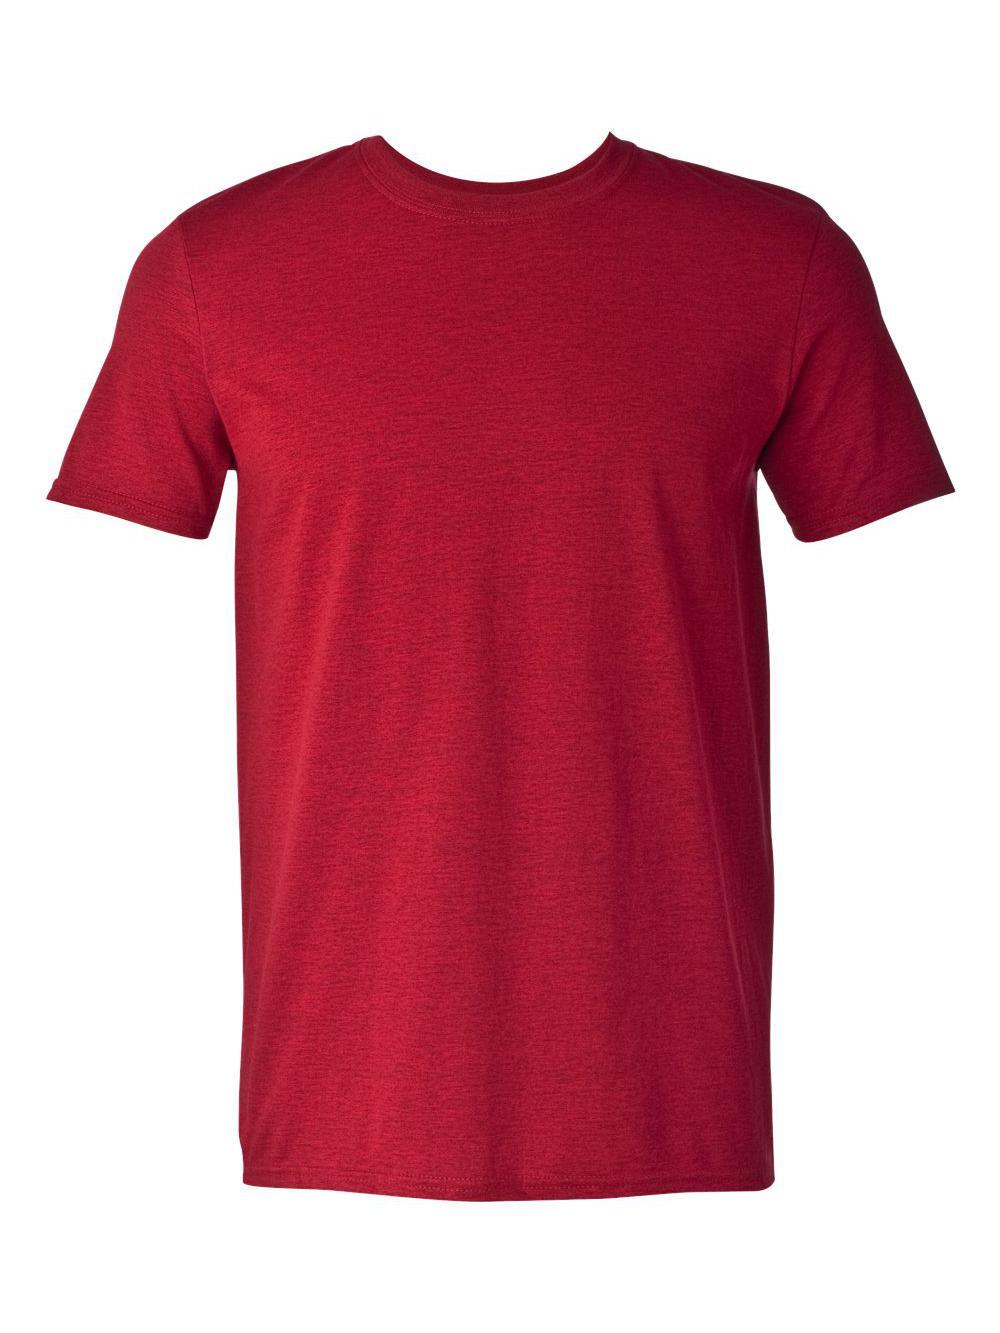 Gildan-Softstyle-T-Shirt-64000 thumbnail 3